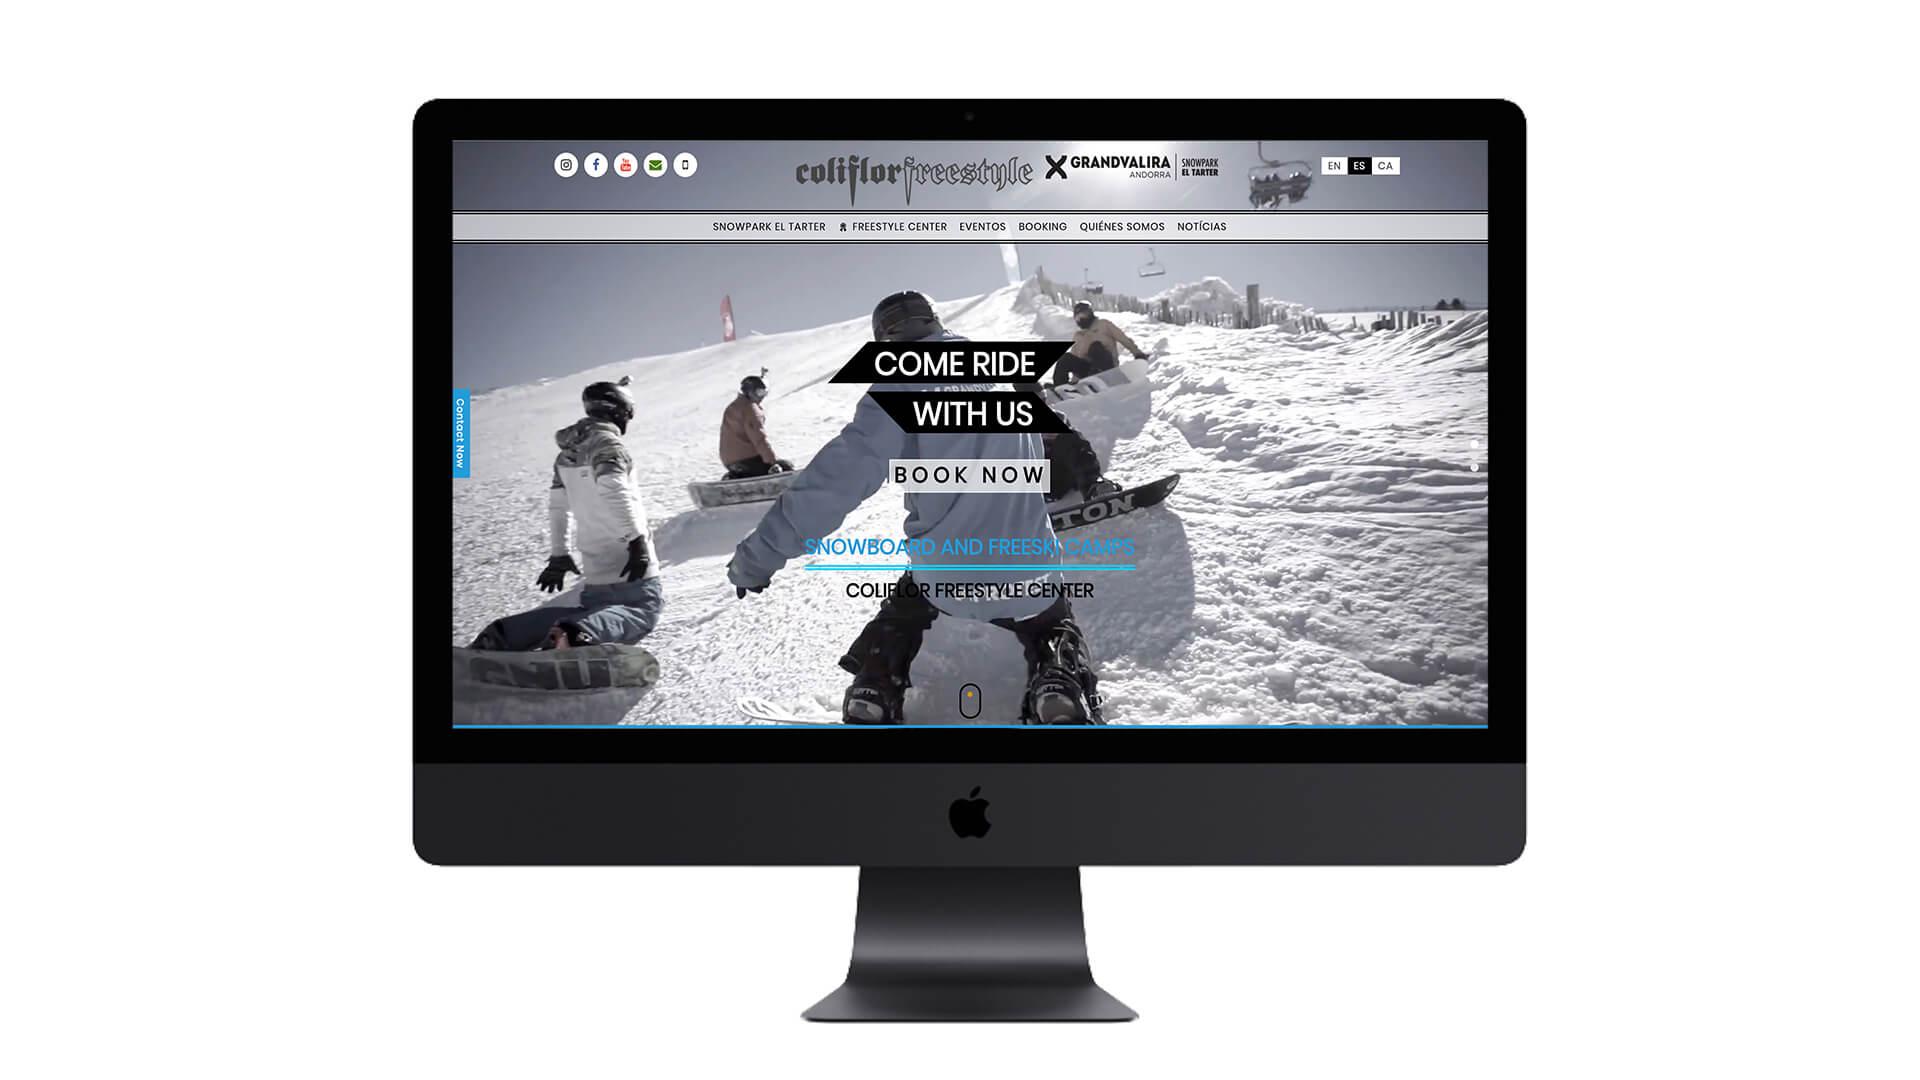 Coliflor Freestyle